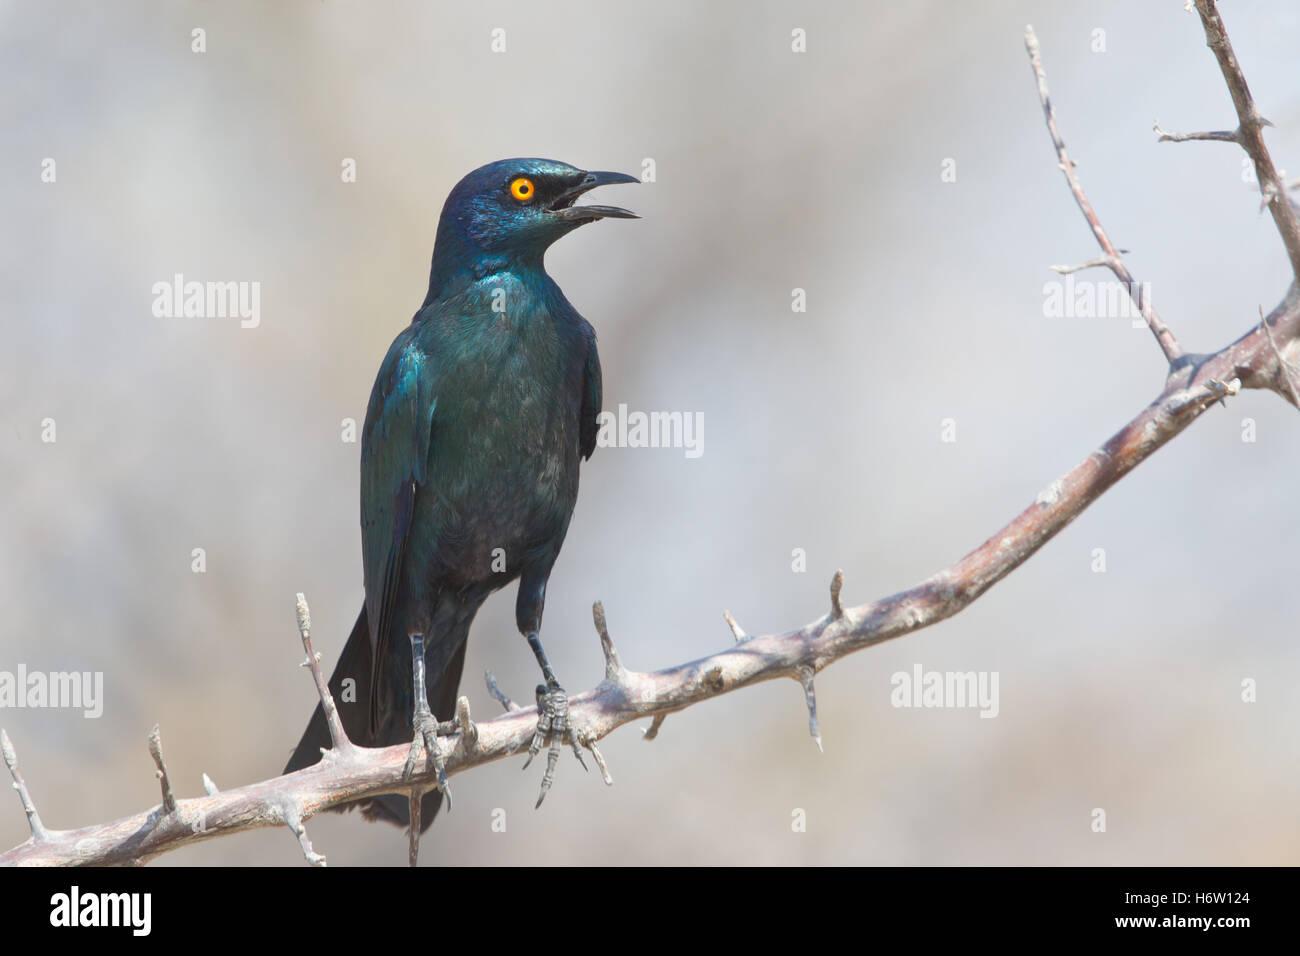 bird namibia birds bird namibia birds glanzstar schwarzbauch glanzstar schwarzbauch afrika afrikanisch afrikanische - Stock Image